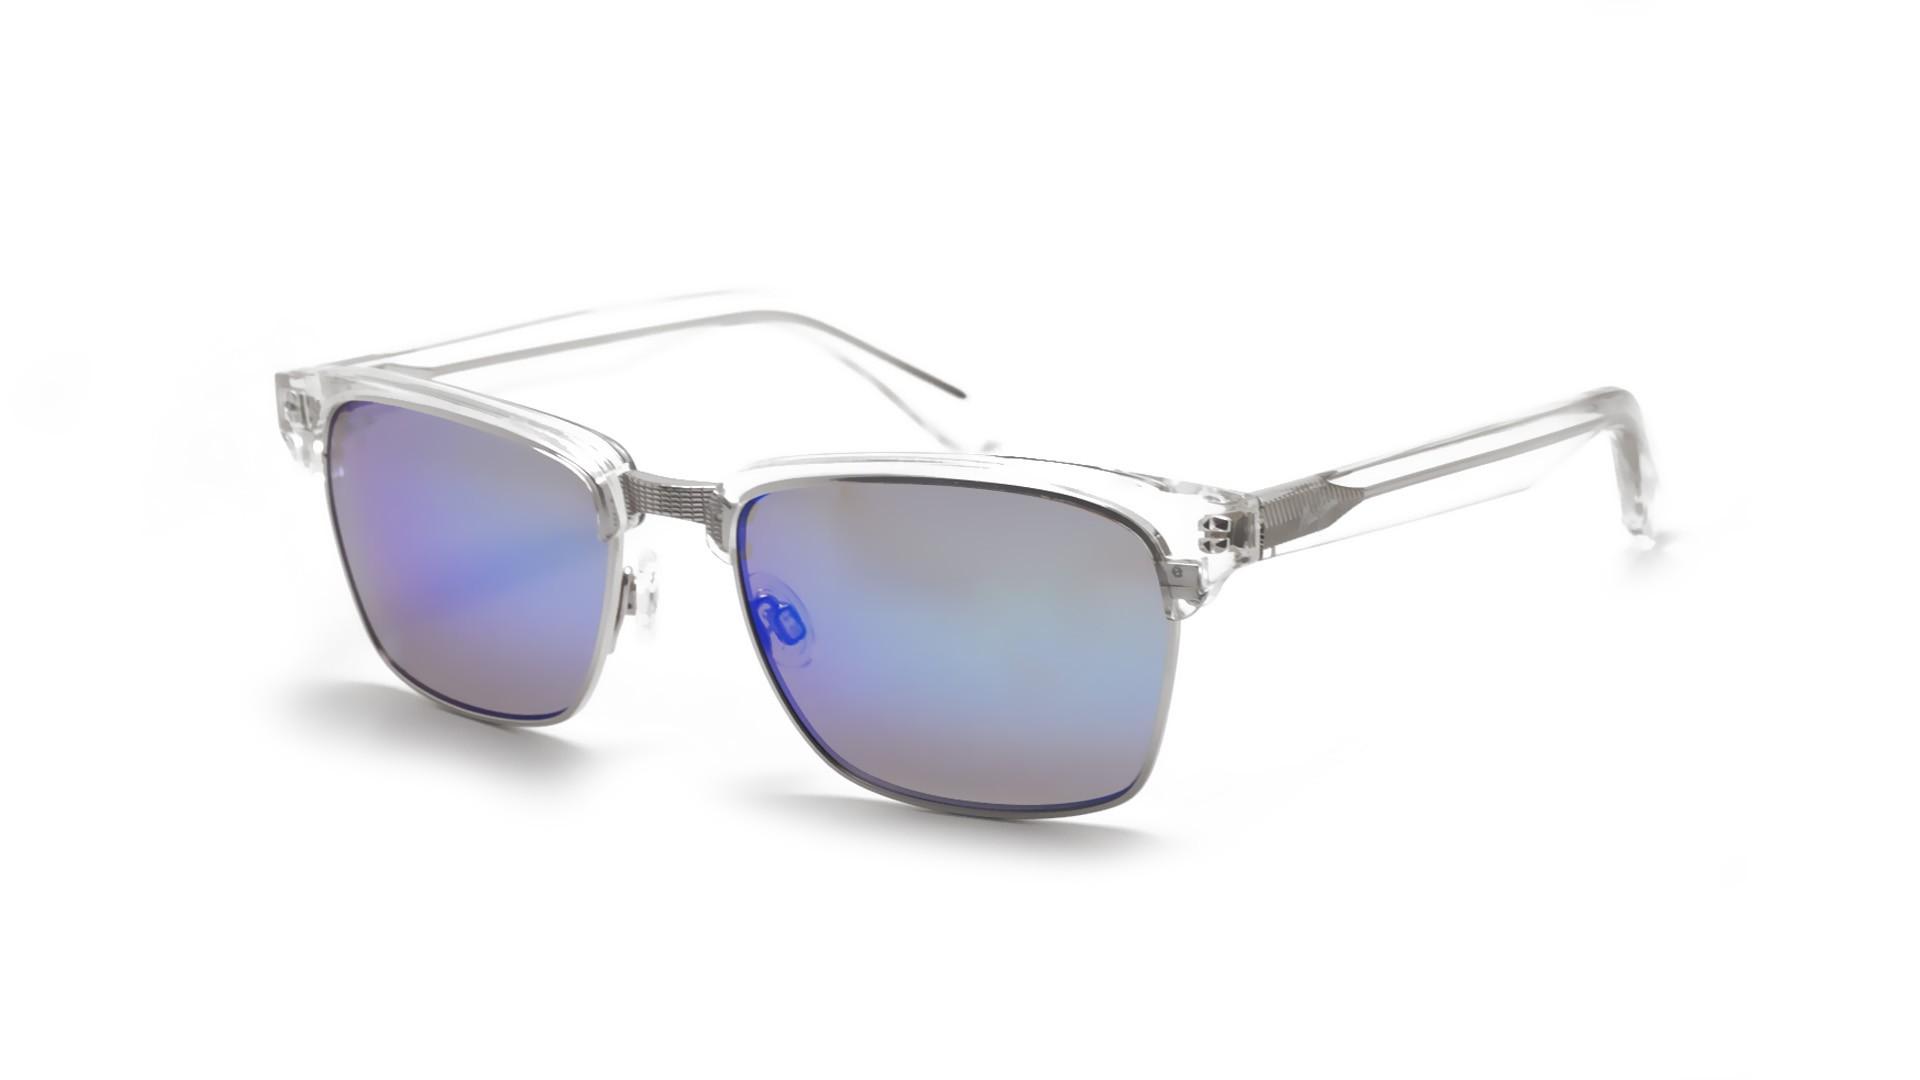 59c7f6d9ebd Sunglasses Maui Jim Kawika Clear B257 05CR 54-18 Medium Polarized Mirror